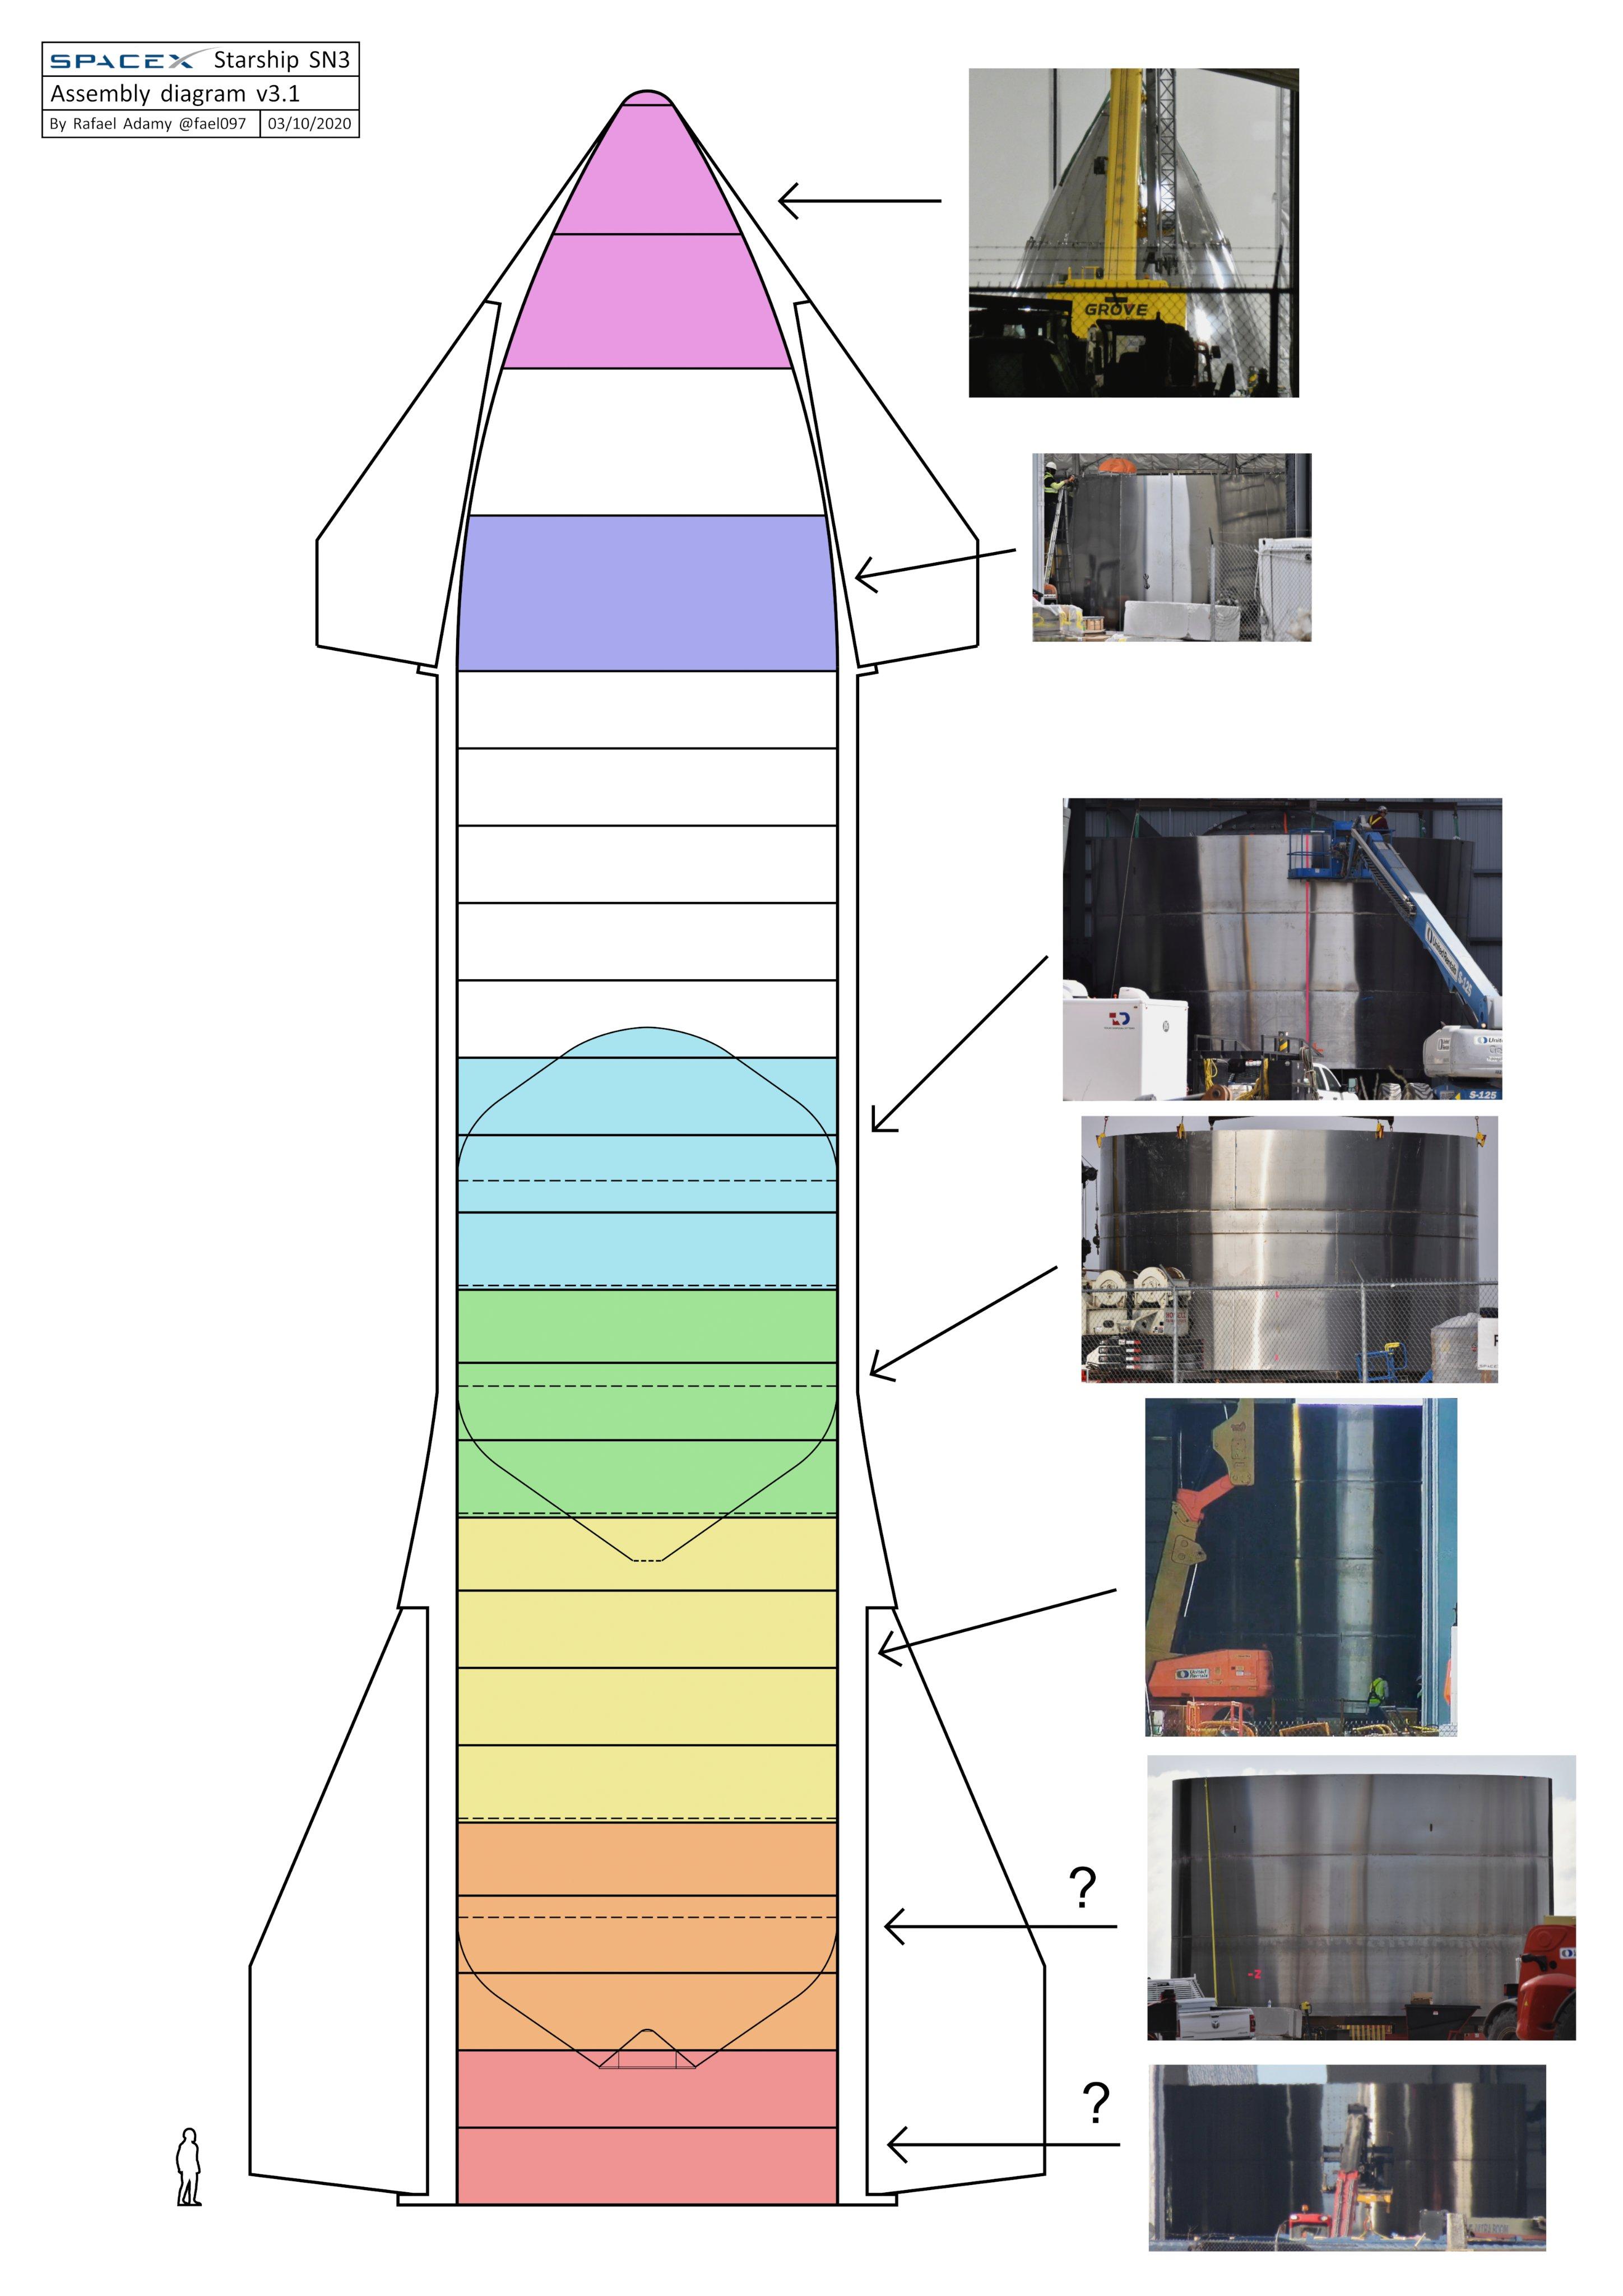 Starship SN3 (Boca Chica) ESwcmIfU4AEdVUI?format=jpg&name=4096x4096